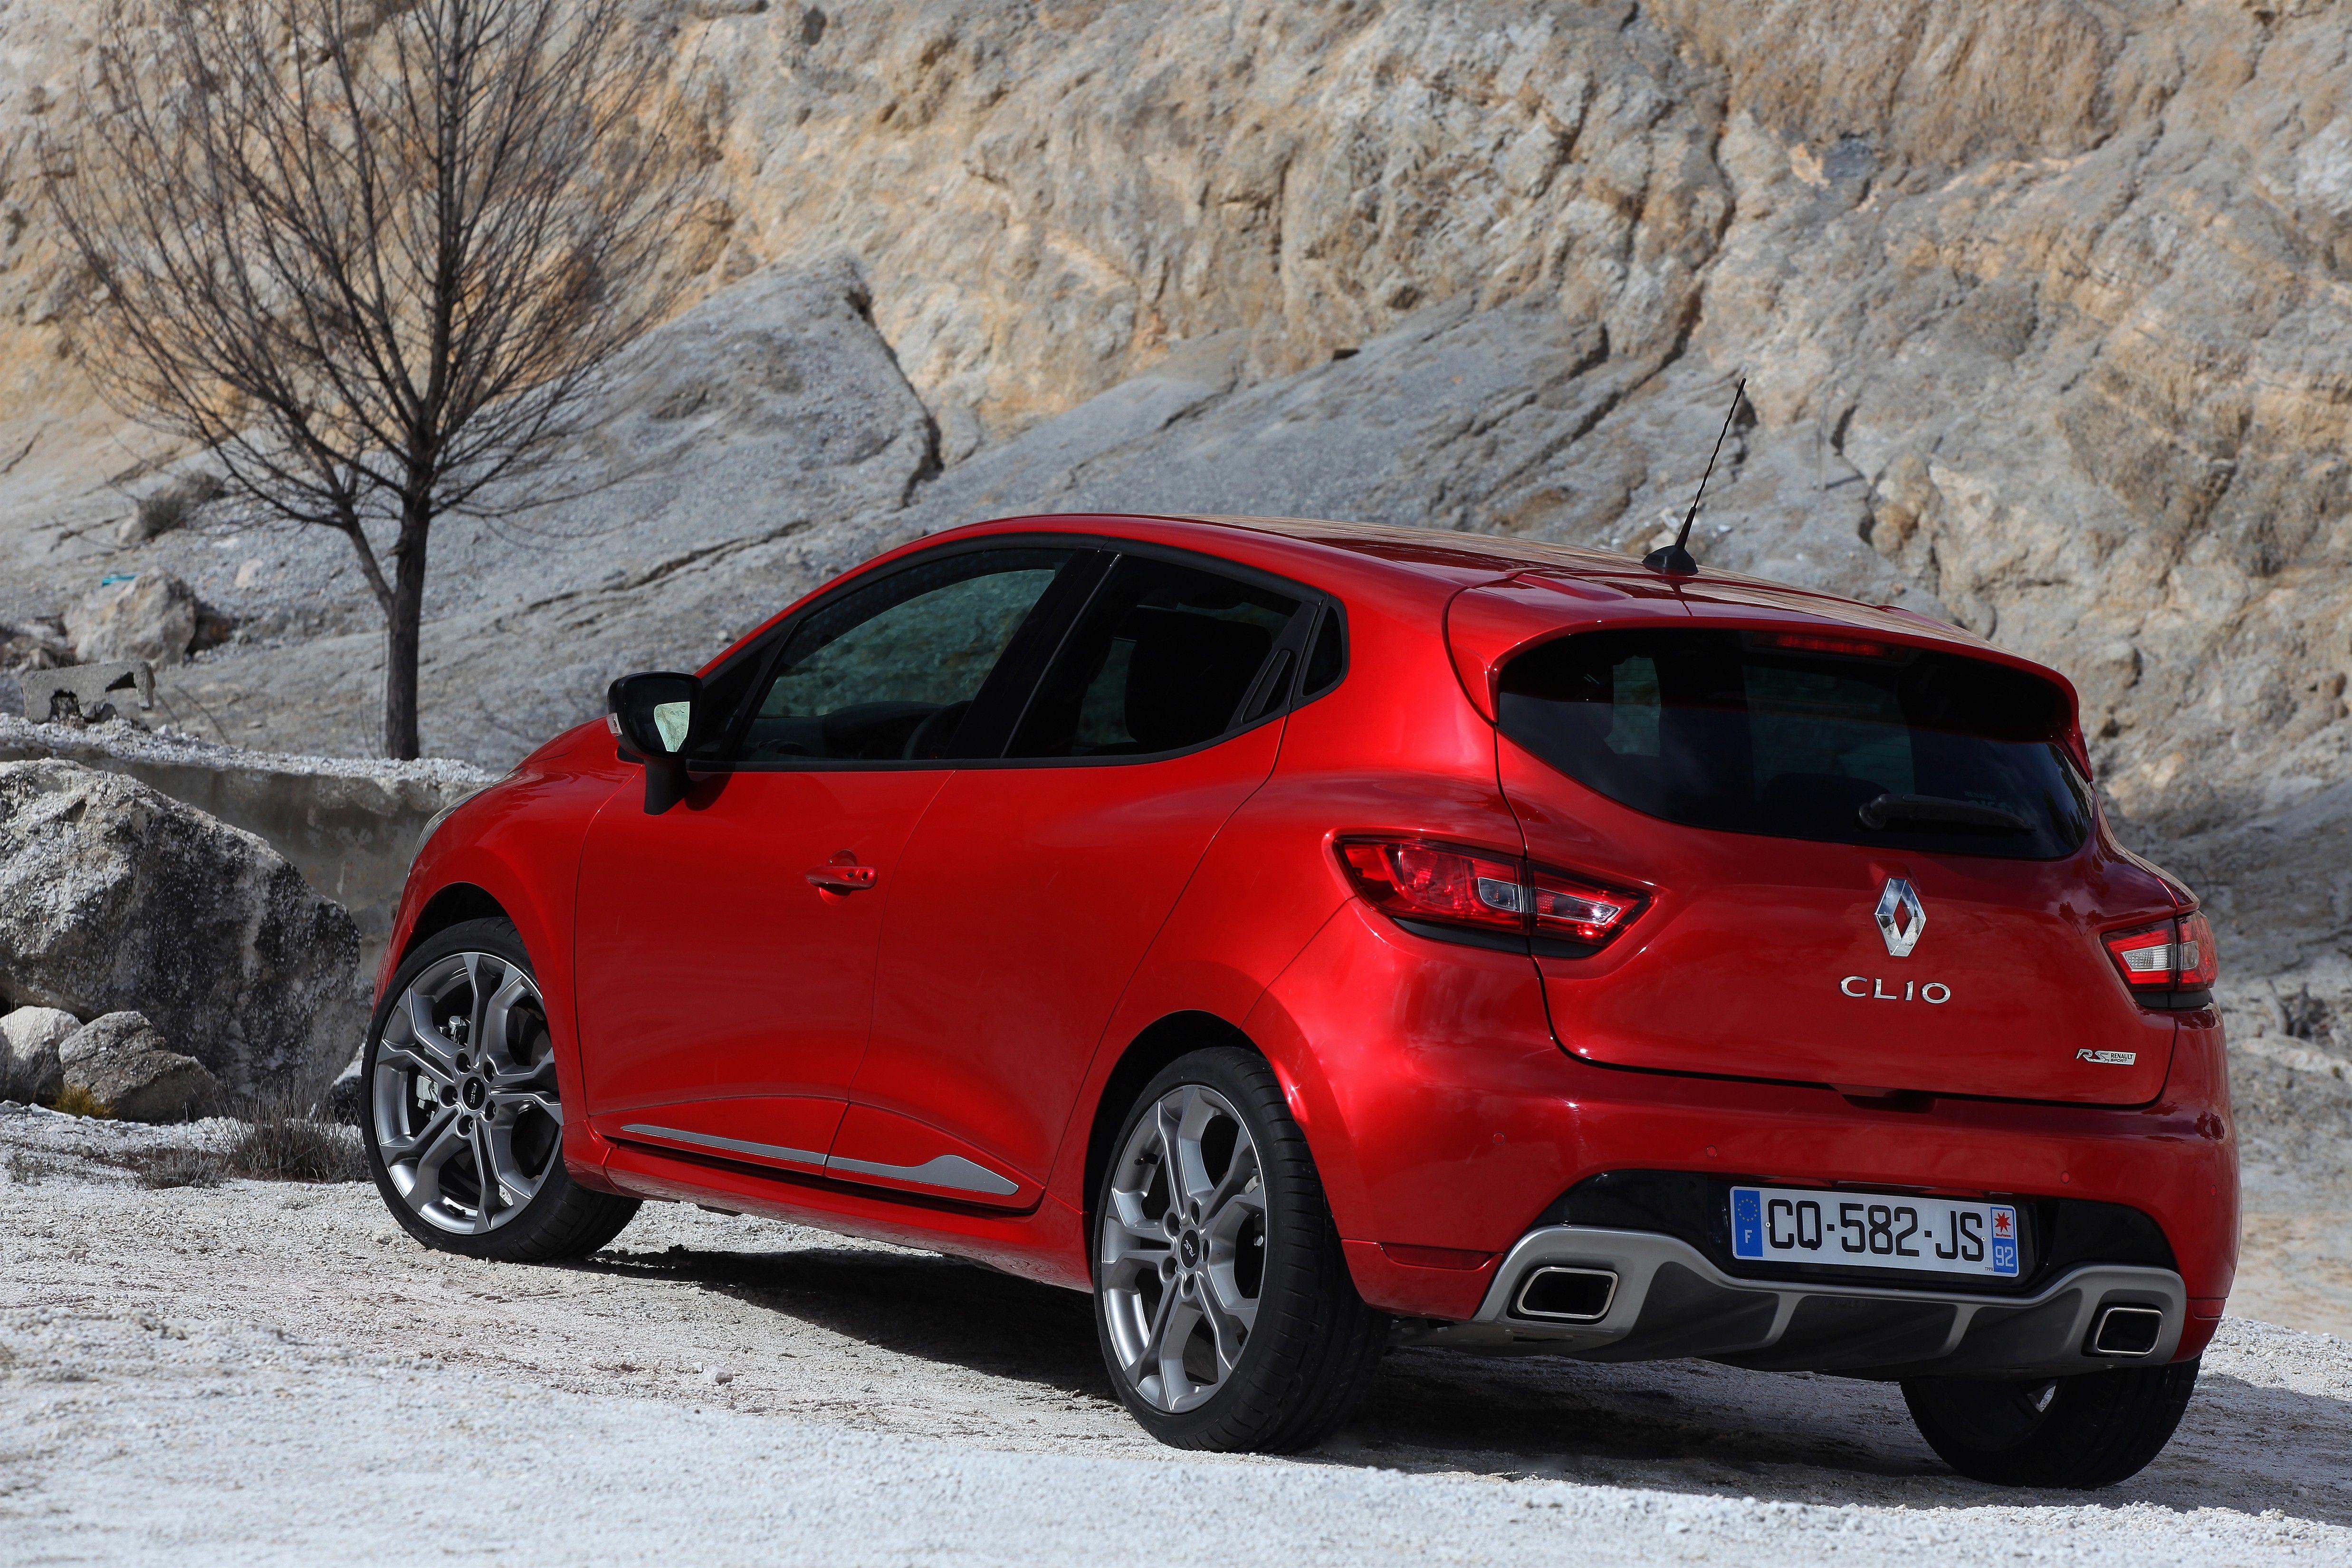 Renault Clio Red Passion Voiture Renault Automobile